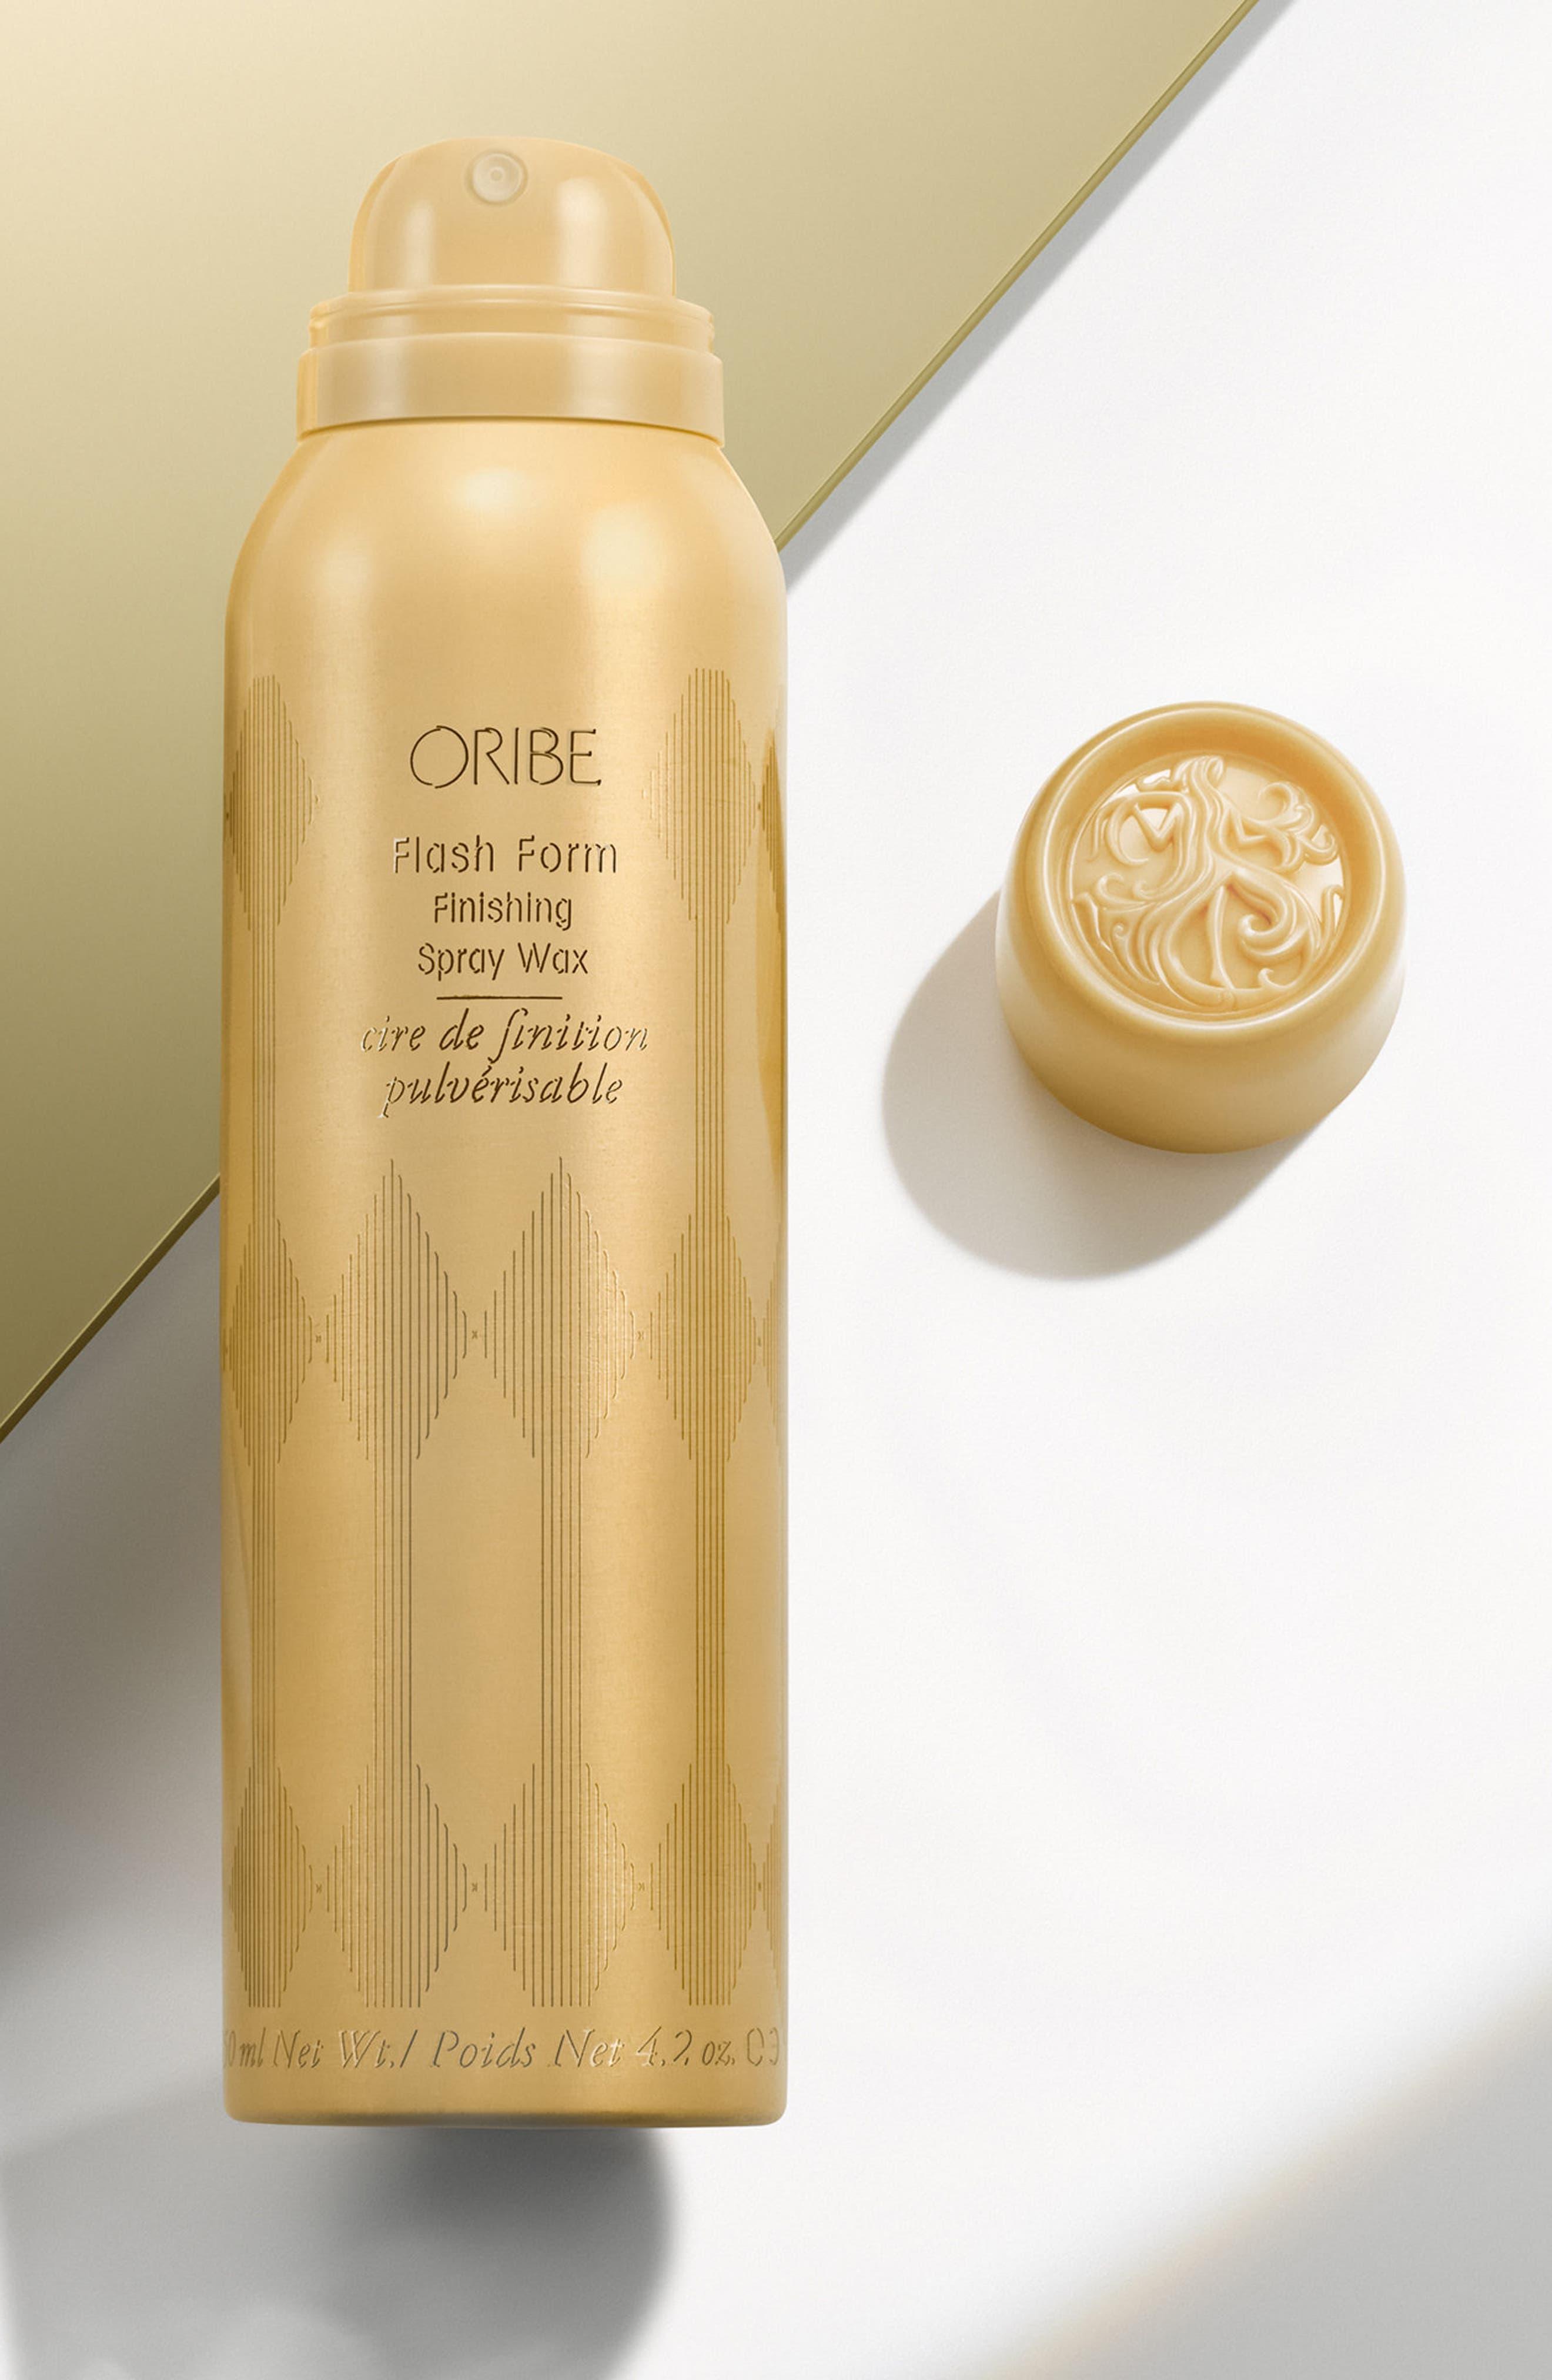 ORIBE, SPACE.NK.apothecary Oribe Flash Form Finishing Spray Wax, Alternate thumbnail 3, color, NO COLOR